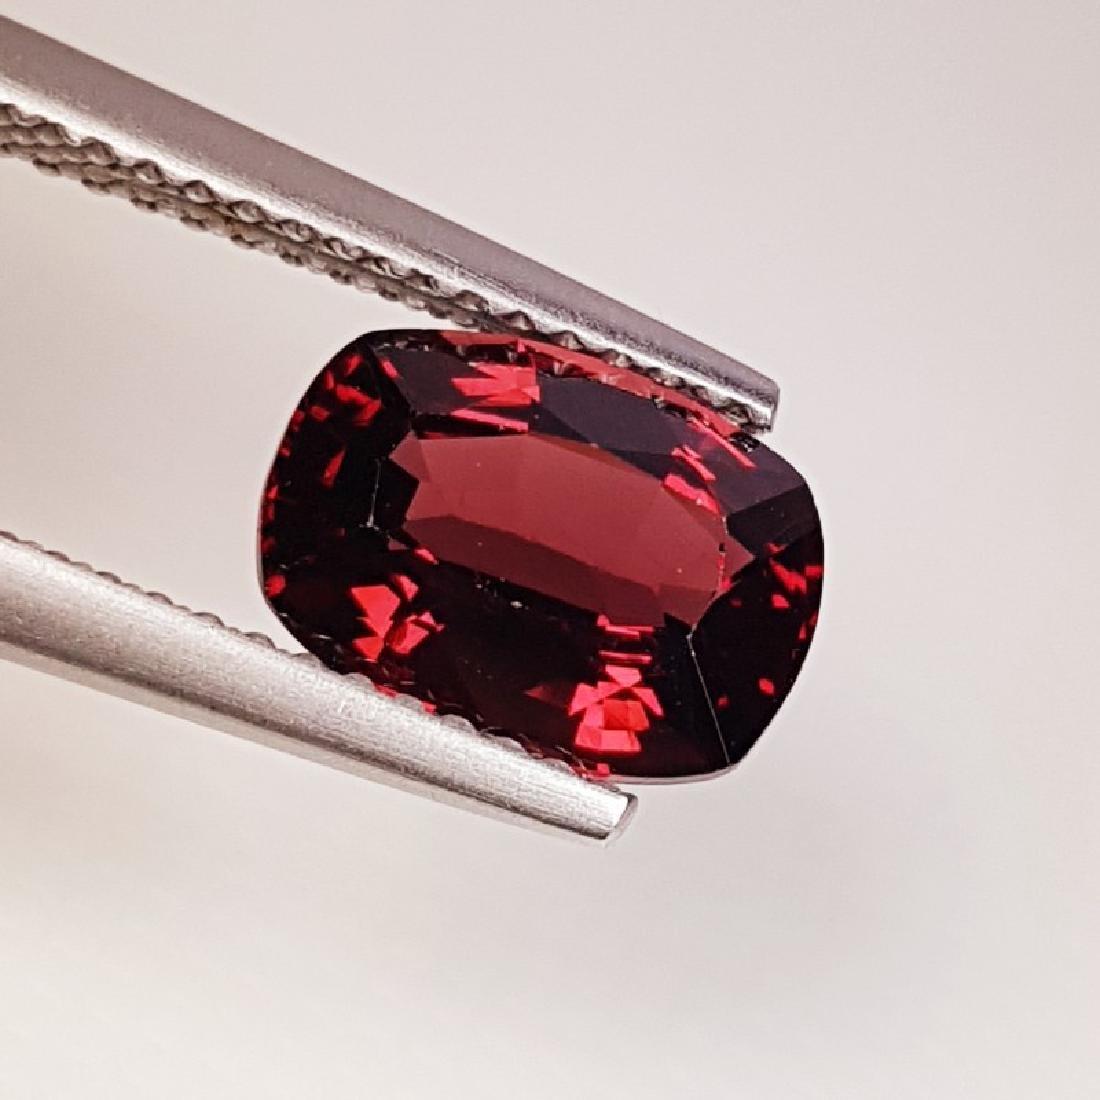 IGI CERTIFIED Natural Pyrope - Almandite Red Garnet - - 2